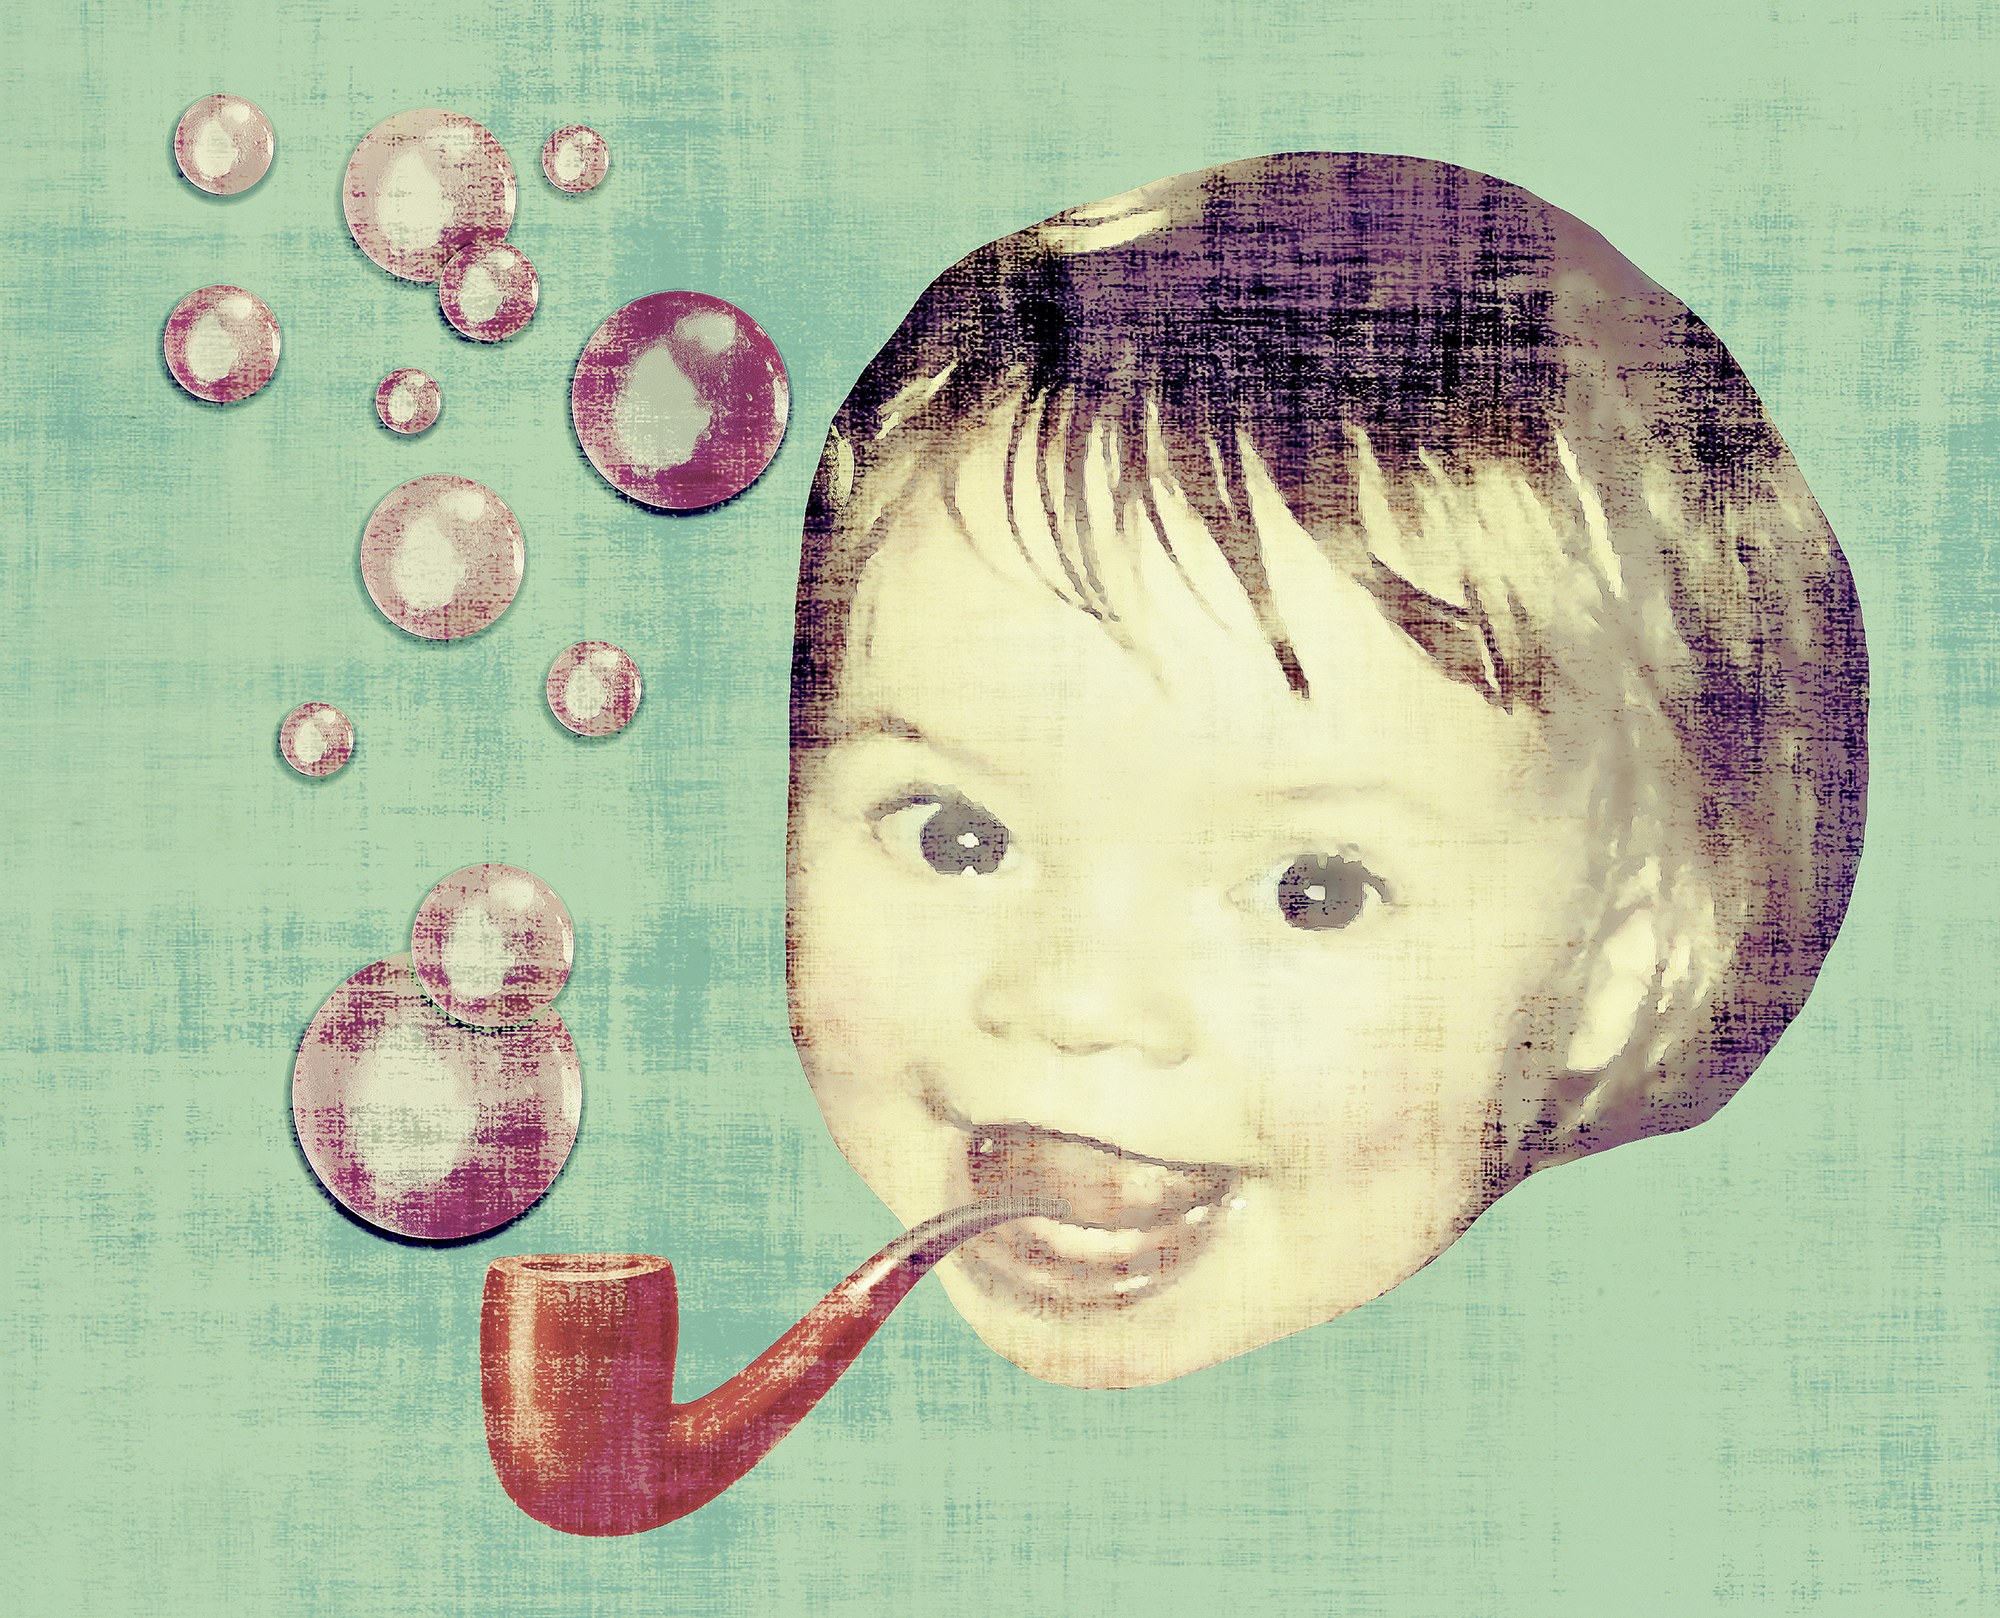 Bubble Pipe by AbsurdWordPreferred